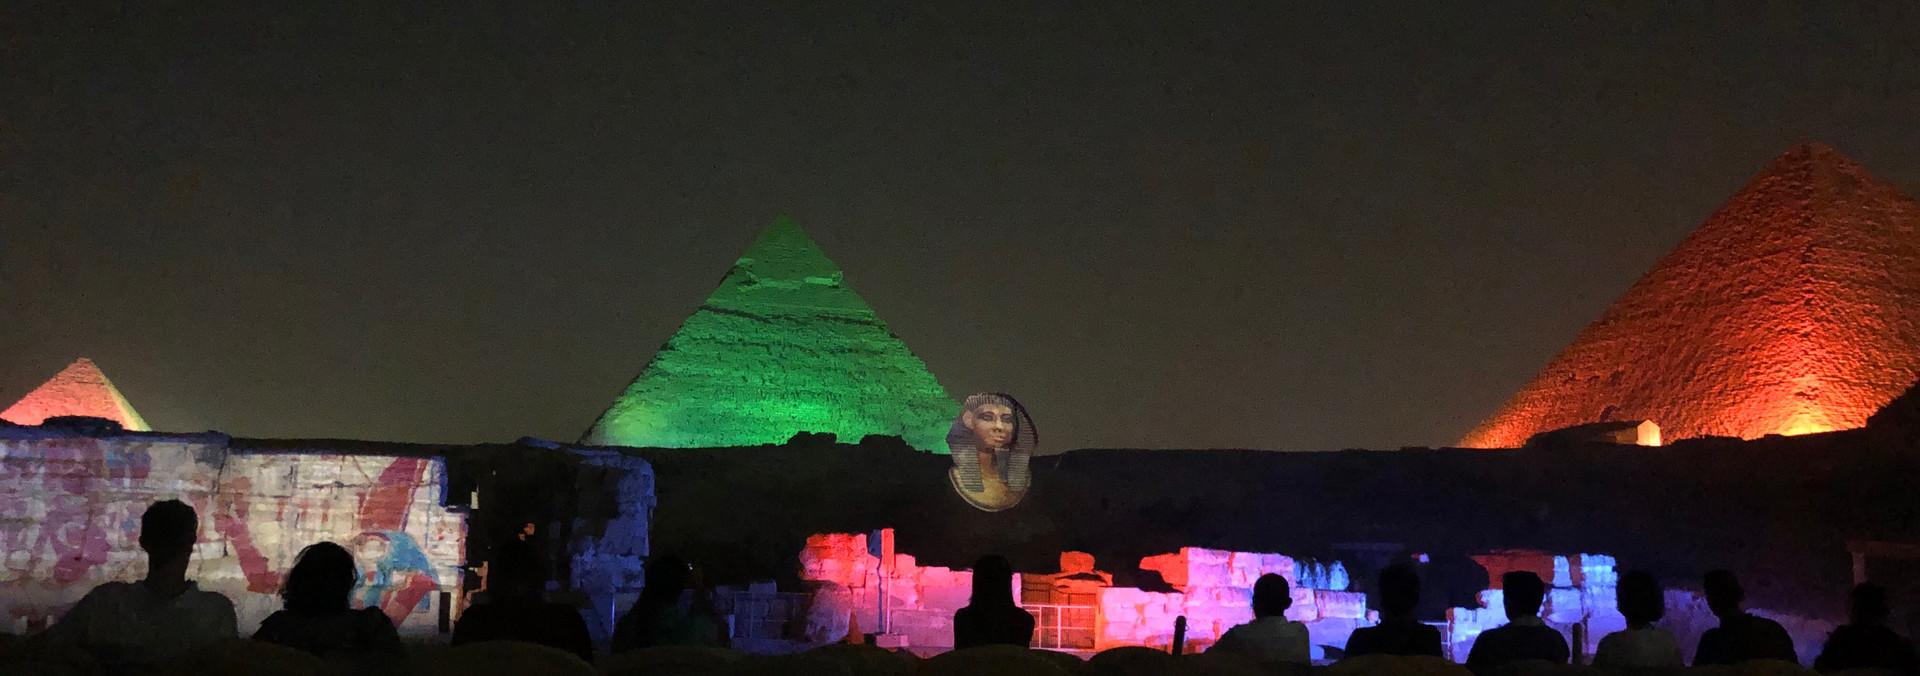 Ron Switzer Pyramid Light Show.jpg